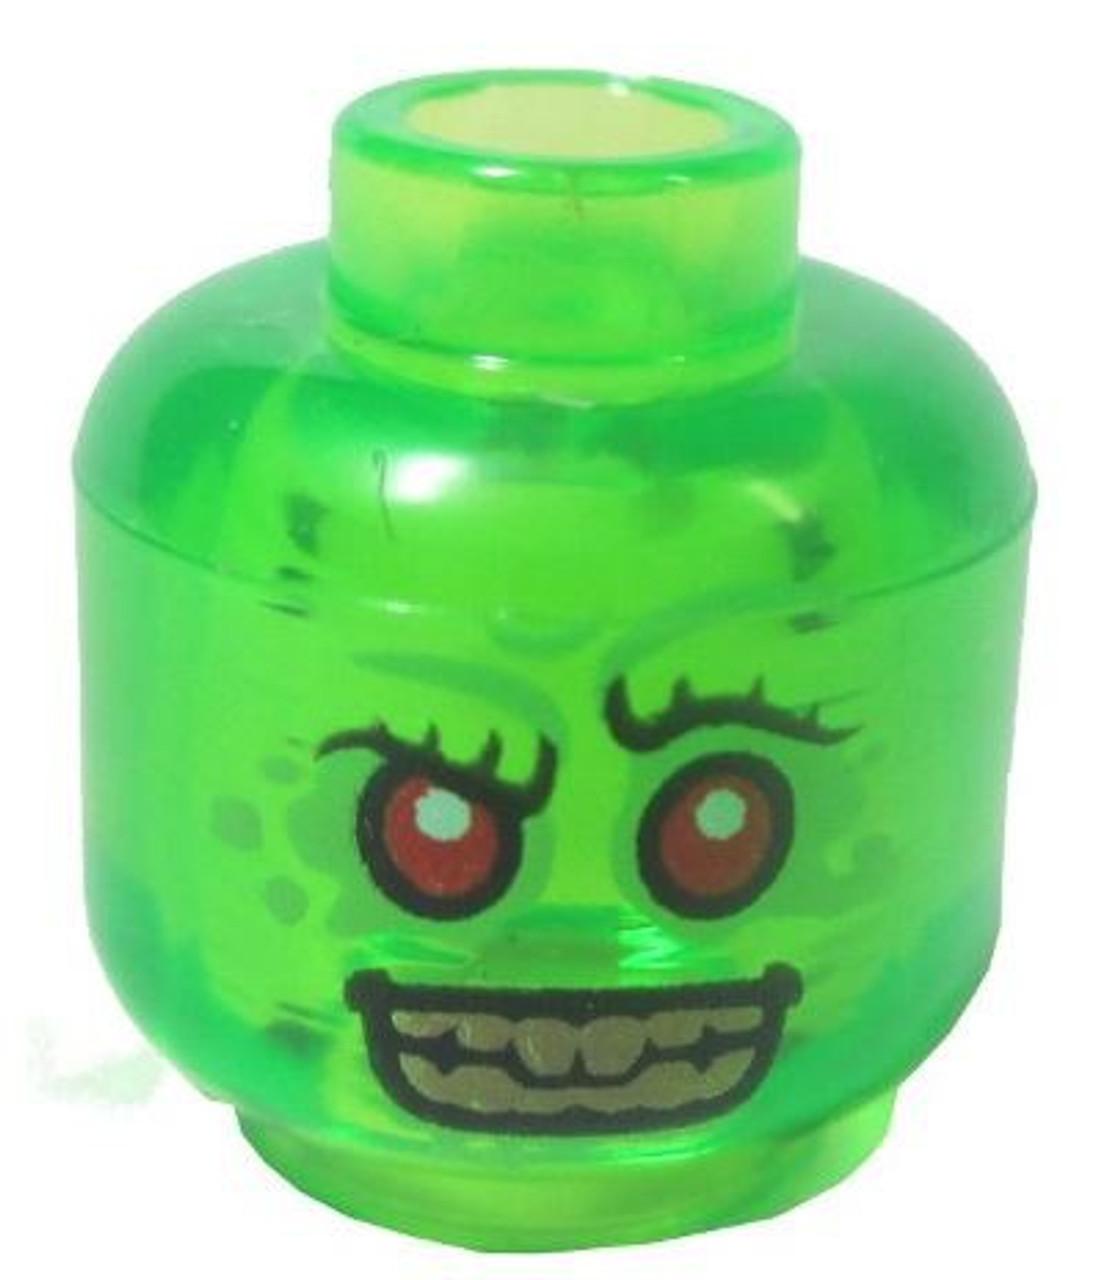 Lego 20 New Sand Green Minifigure Head Alien with Red Eyes Dark Green Lips